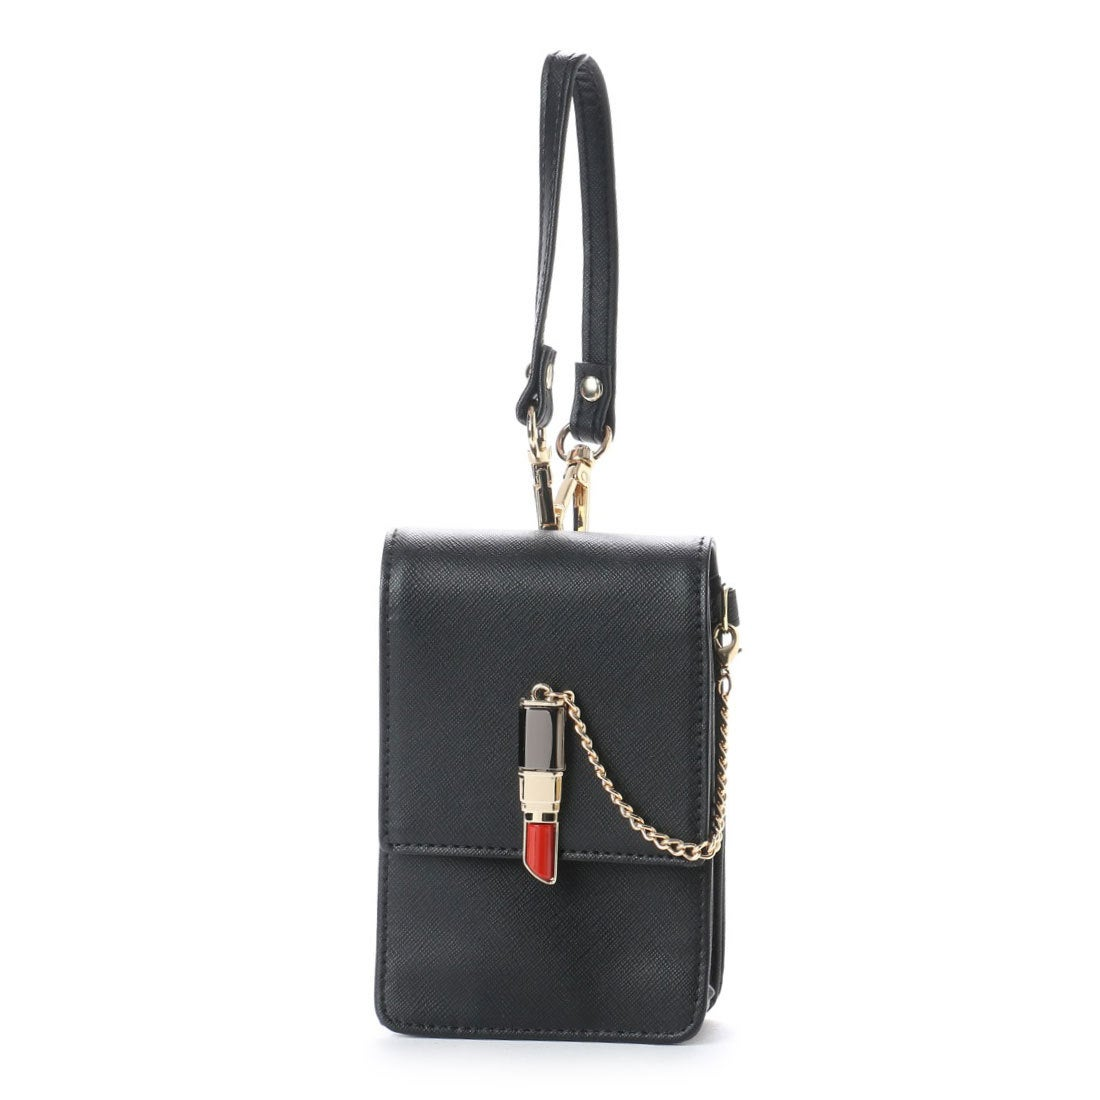 76ae0d37e328 スパイラルガール SPIRAL GIRL 口紅型金具付きシガレットケース (ブラック) -靴&ファッション通販 ロコンド〜自宅で試着、気軽に返品